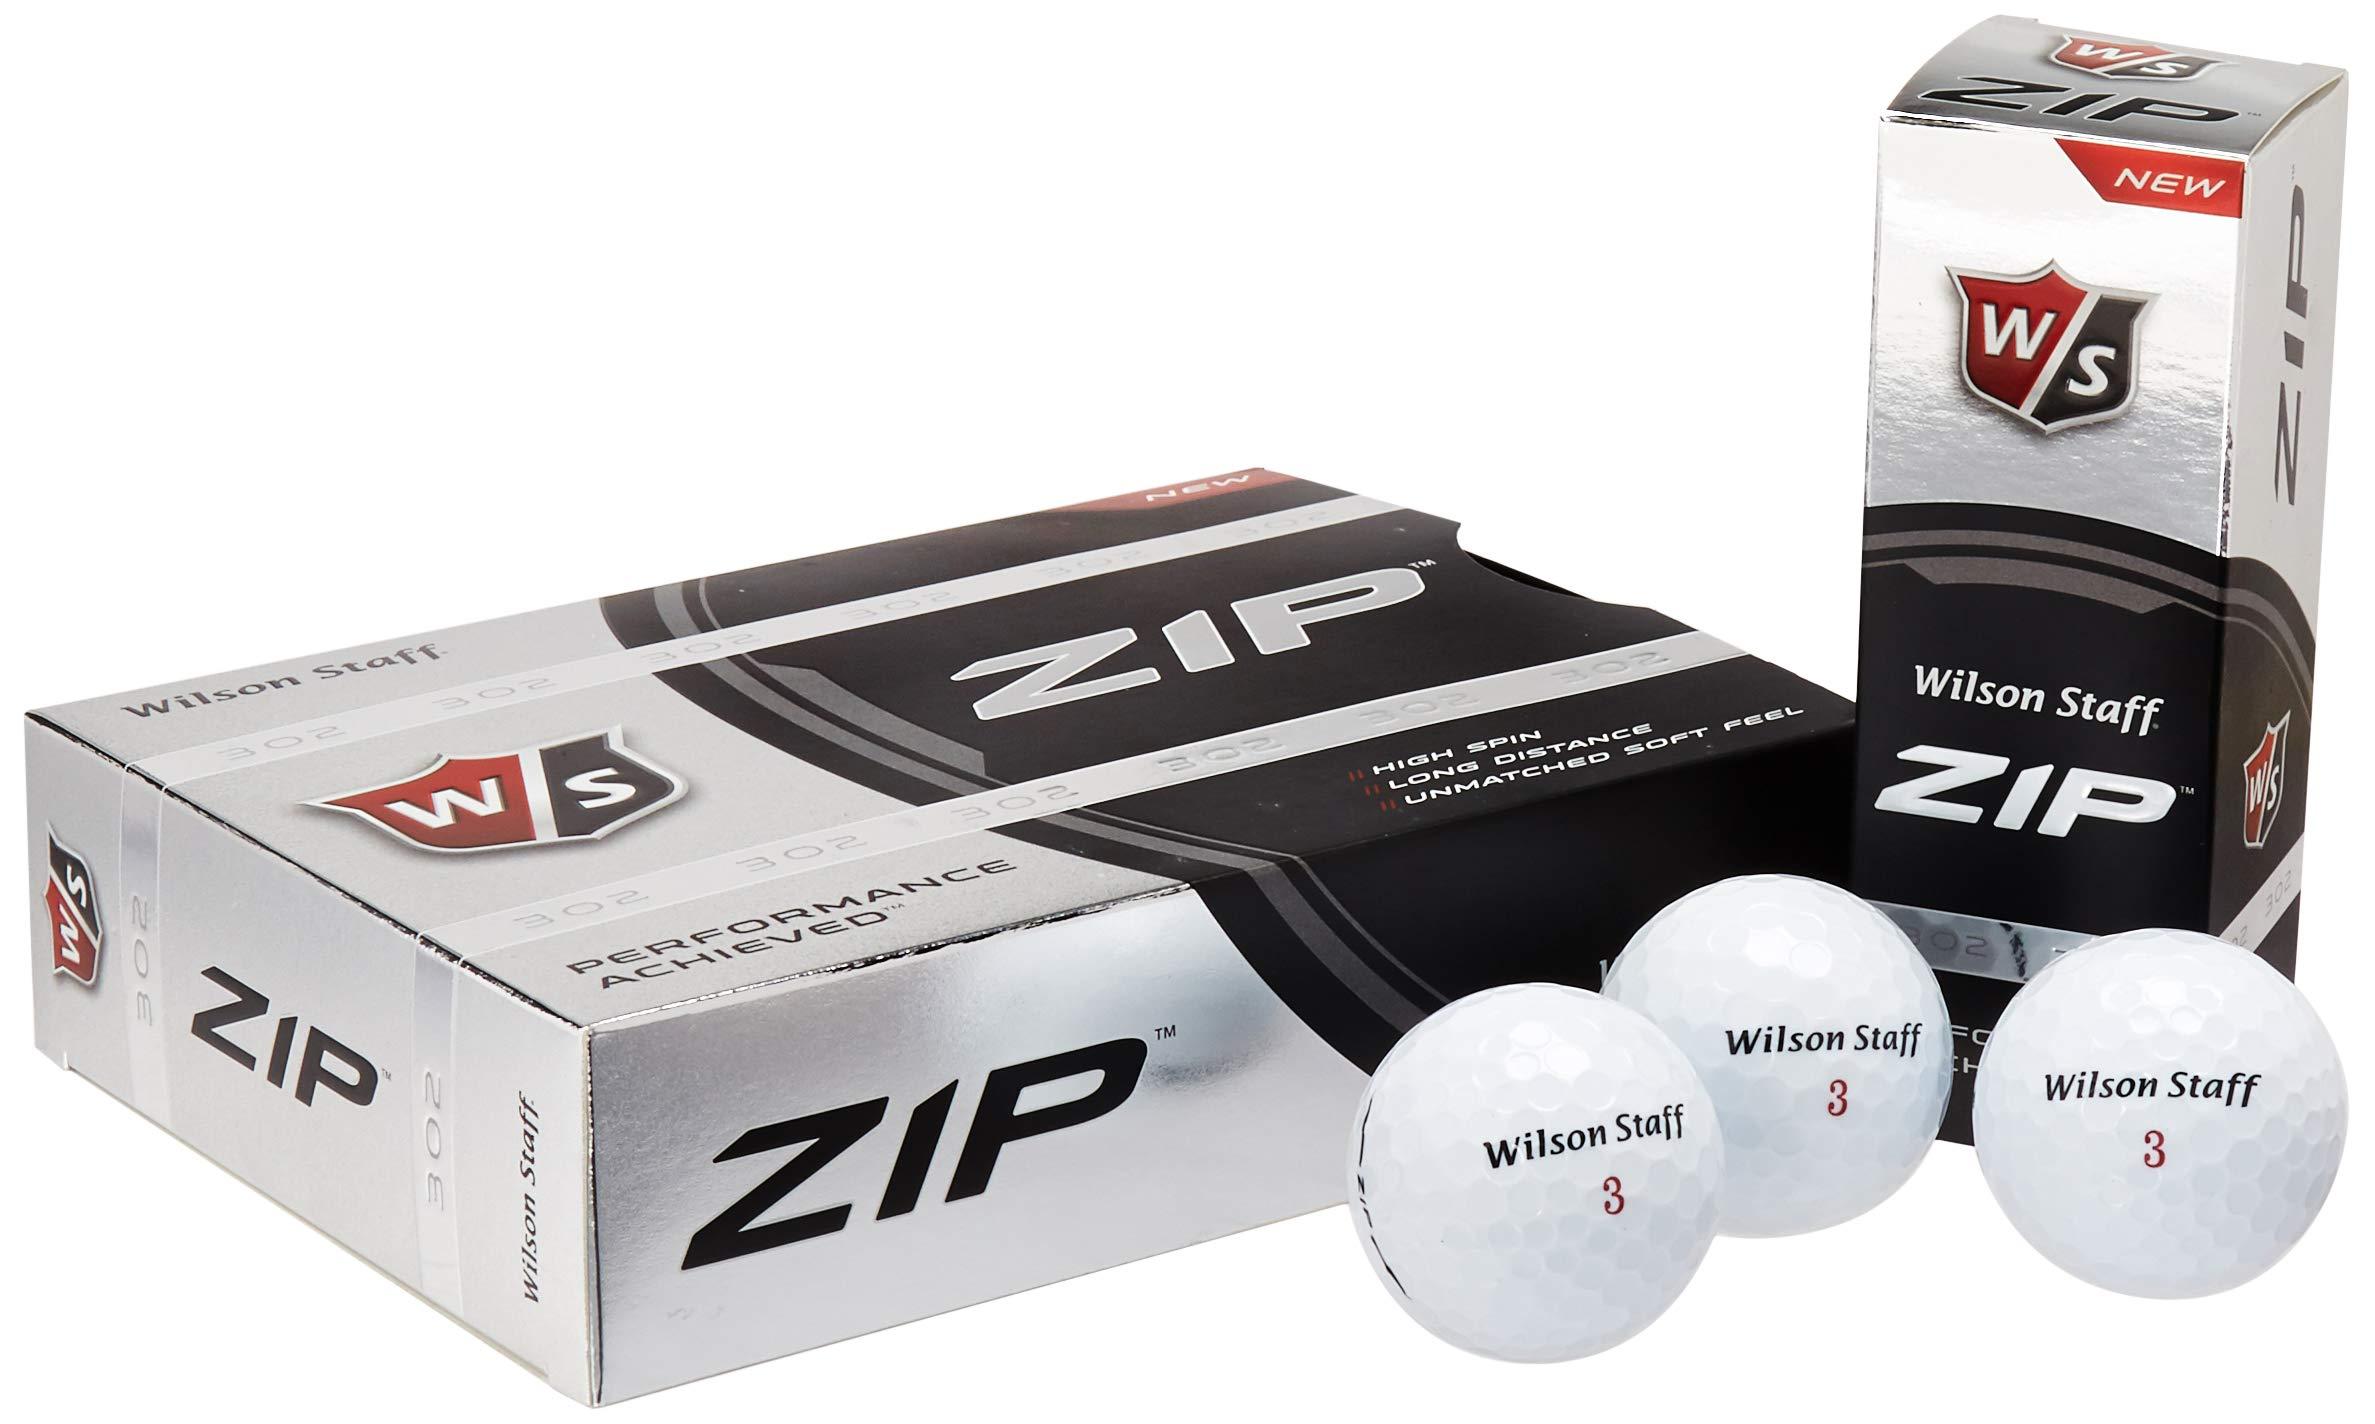 Wilson ZIP Double Dozen Golf Balls, Pack of 24 (White) by Wilson